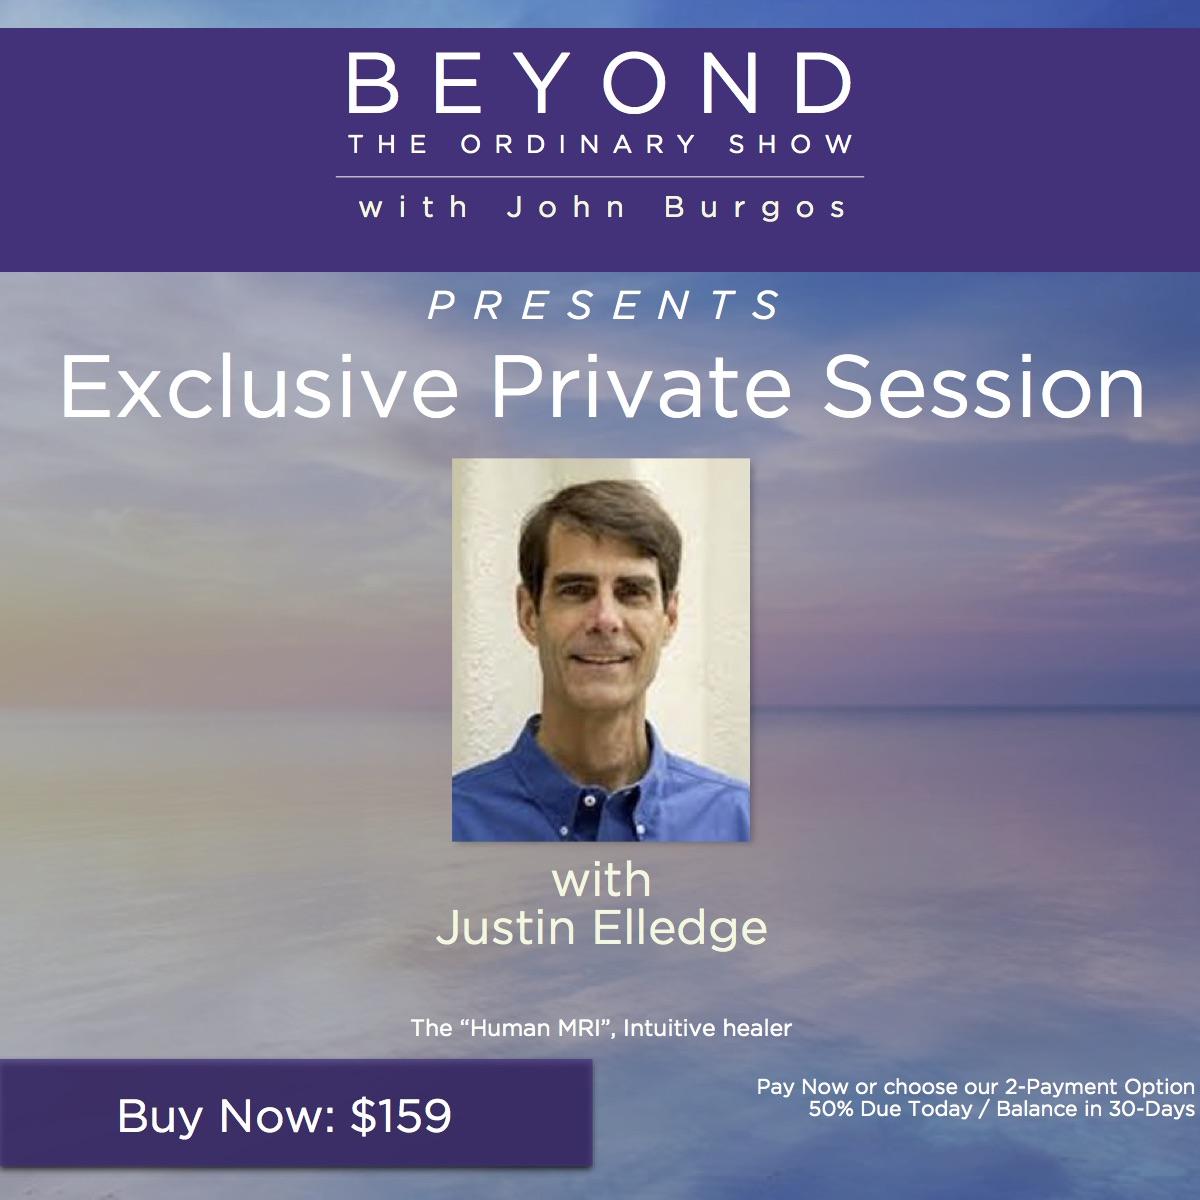 Justin Elledge